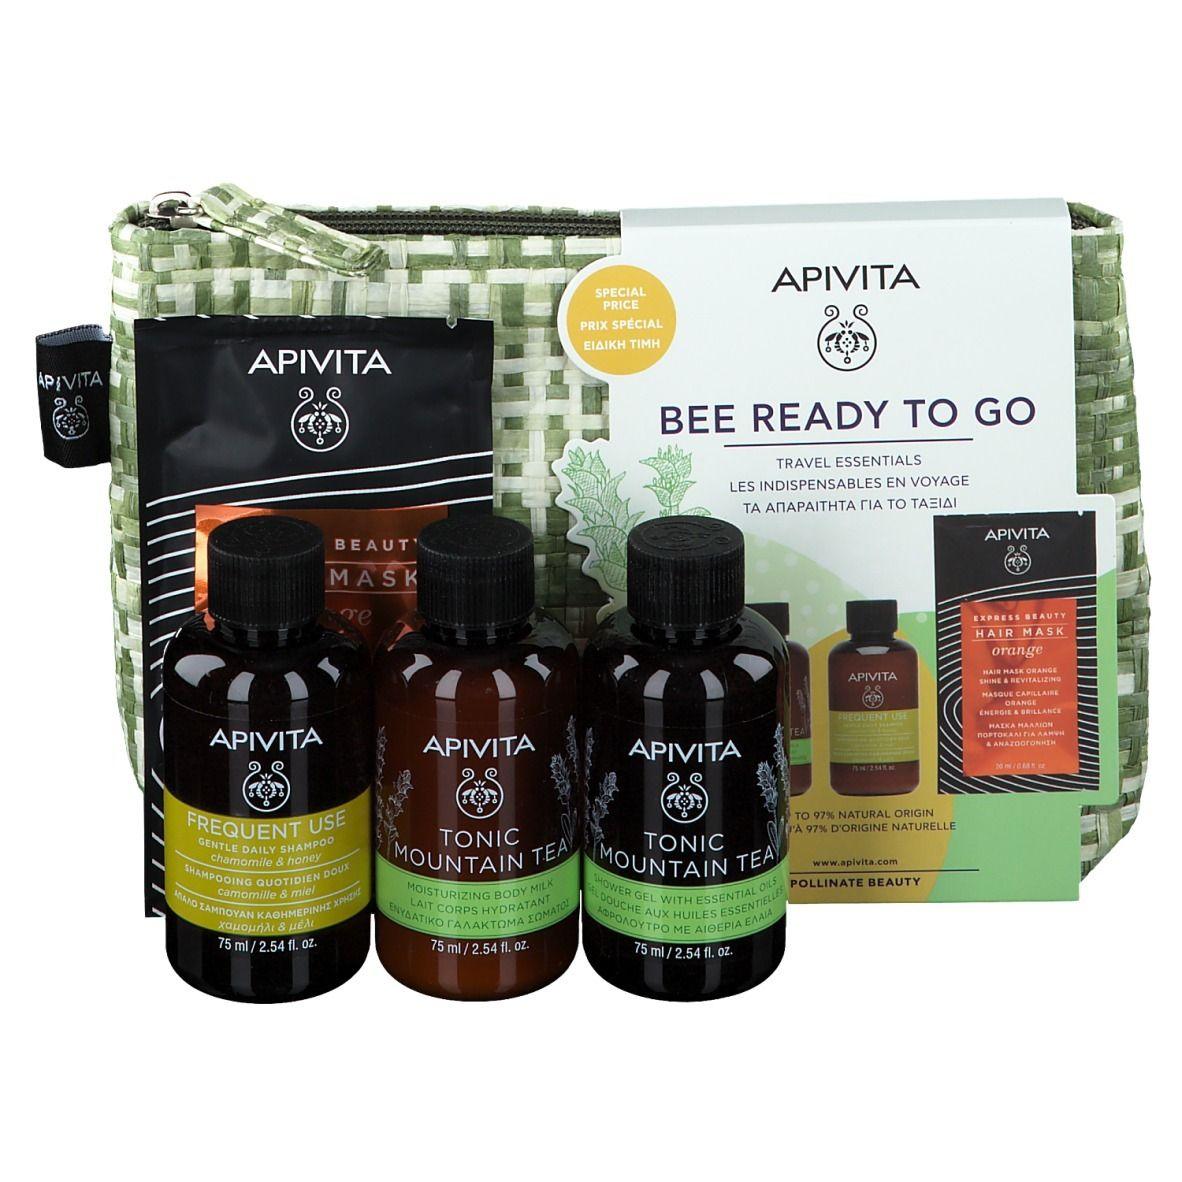 Image of Apivita Bee Ready to go Reiseset